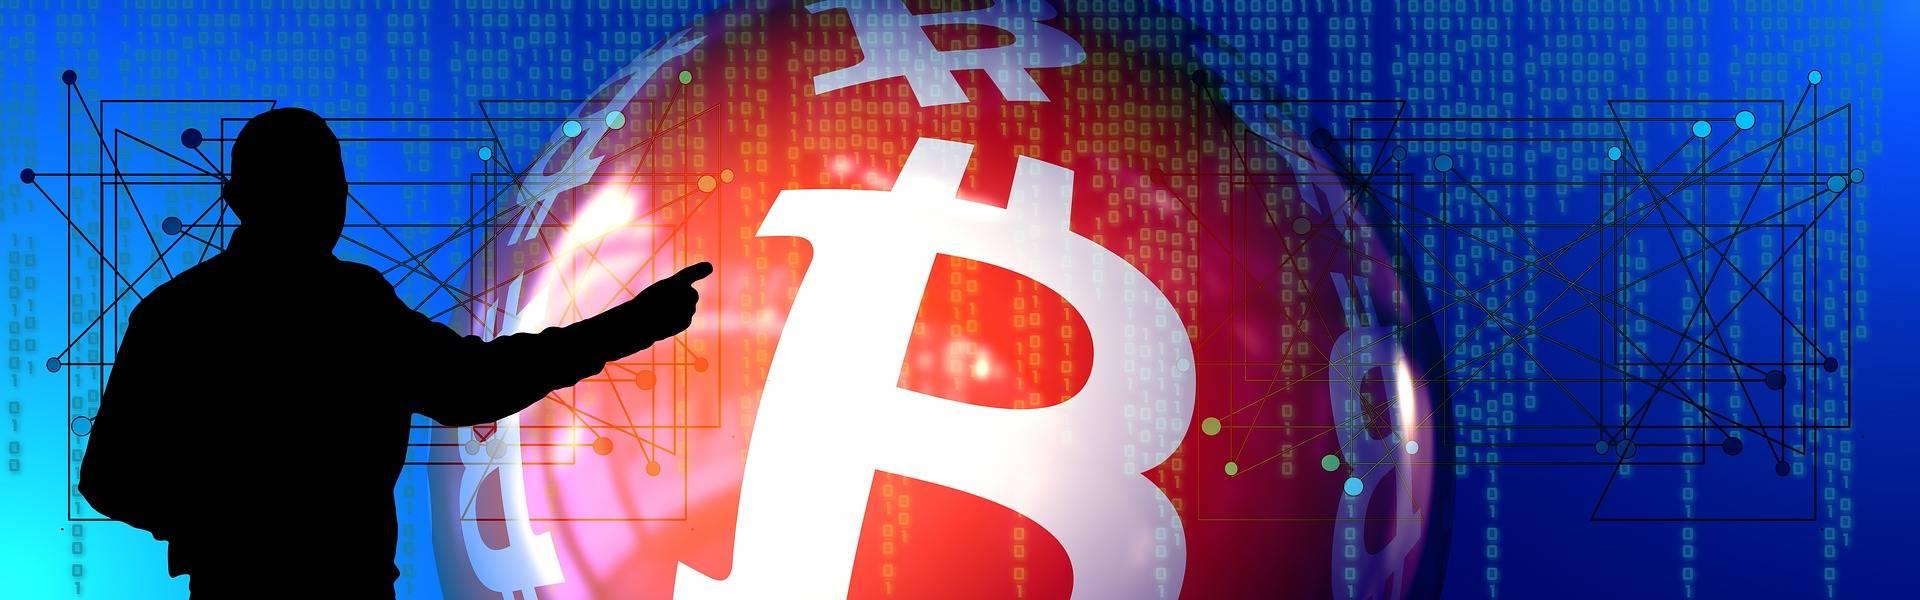 Antonopoulos, prochain Bitcoin BTC